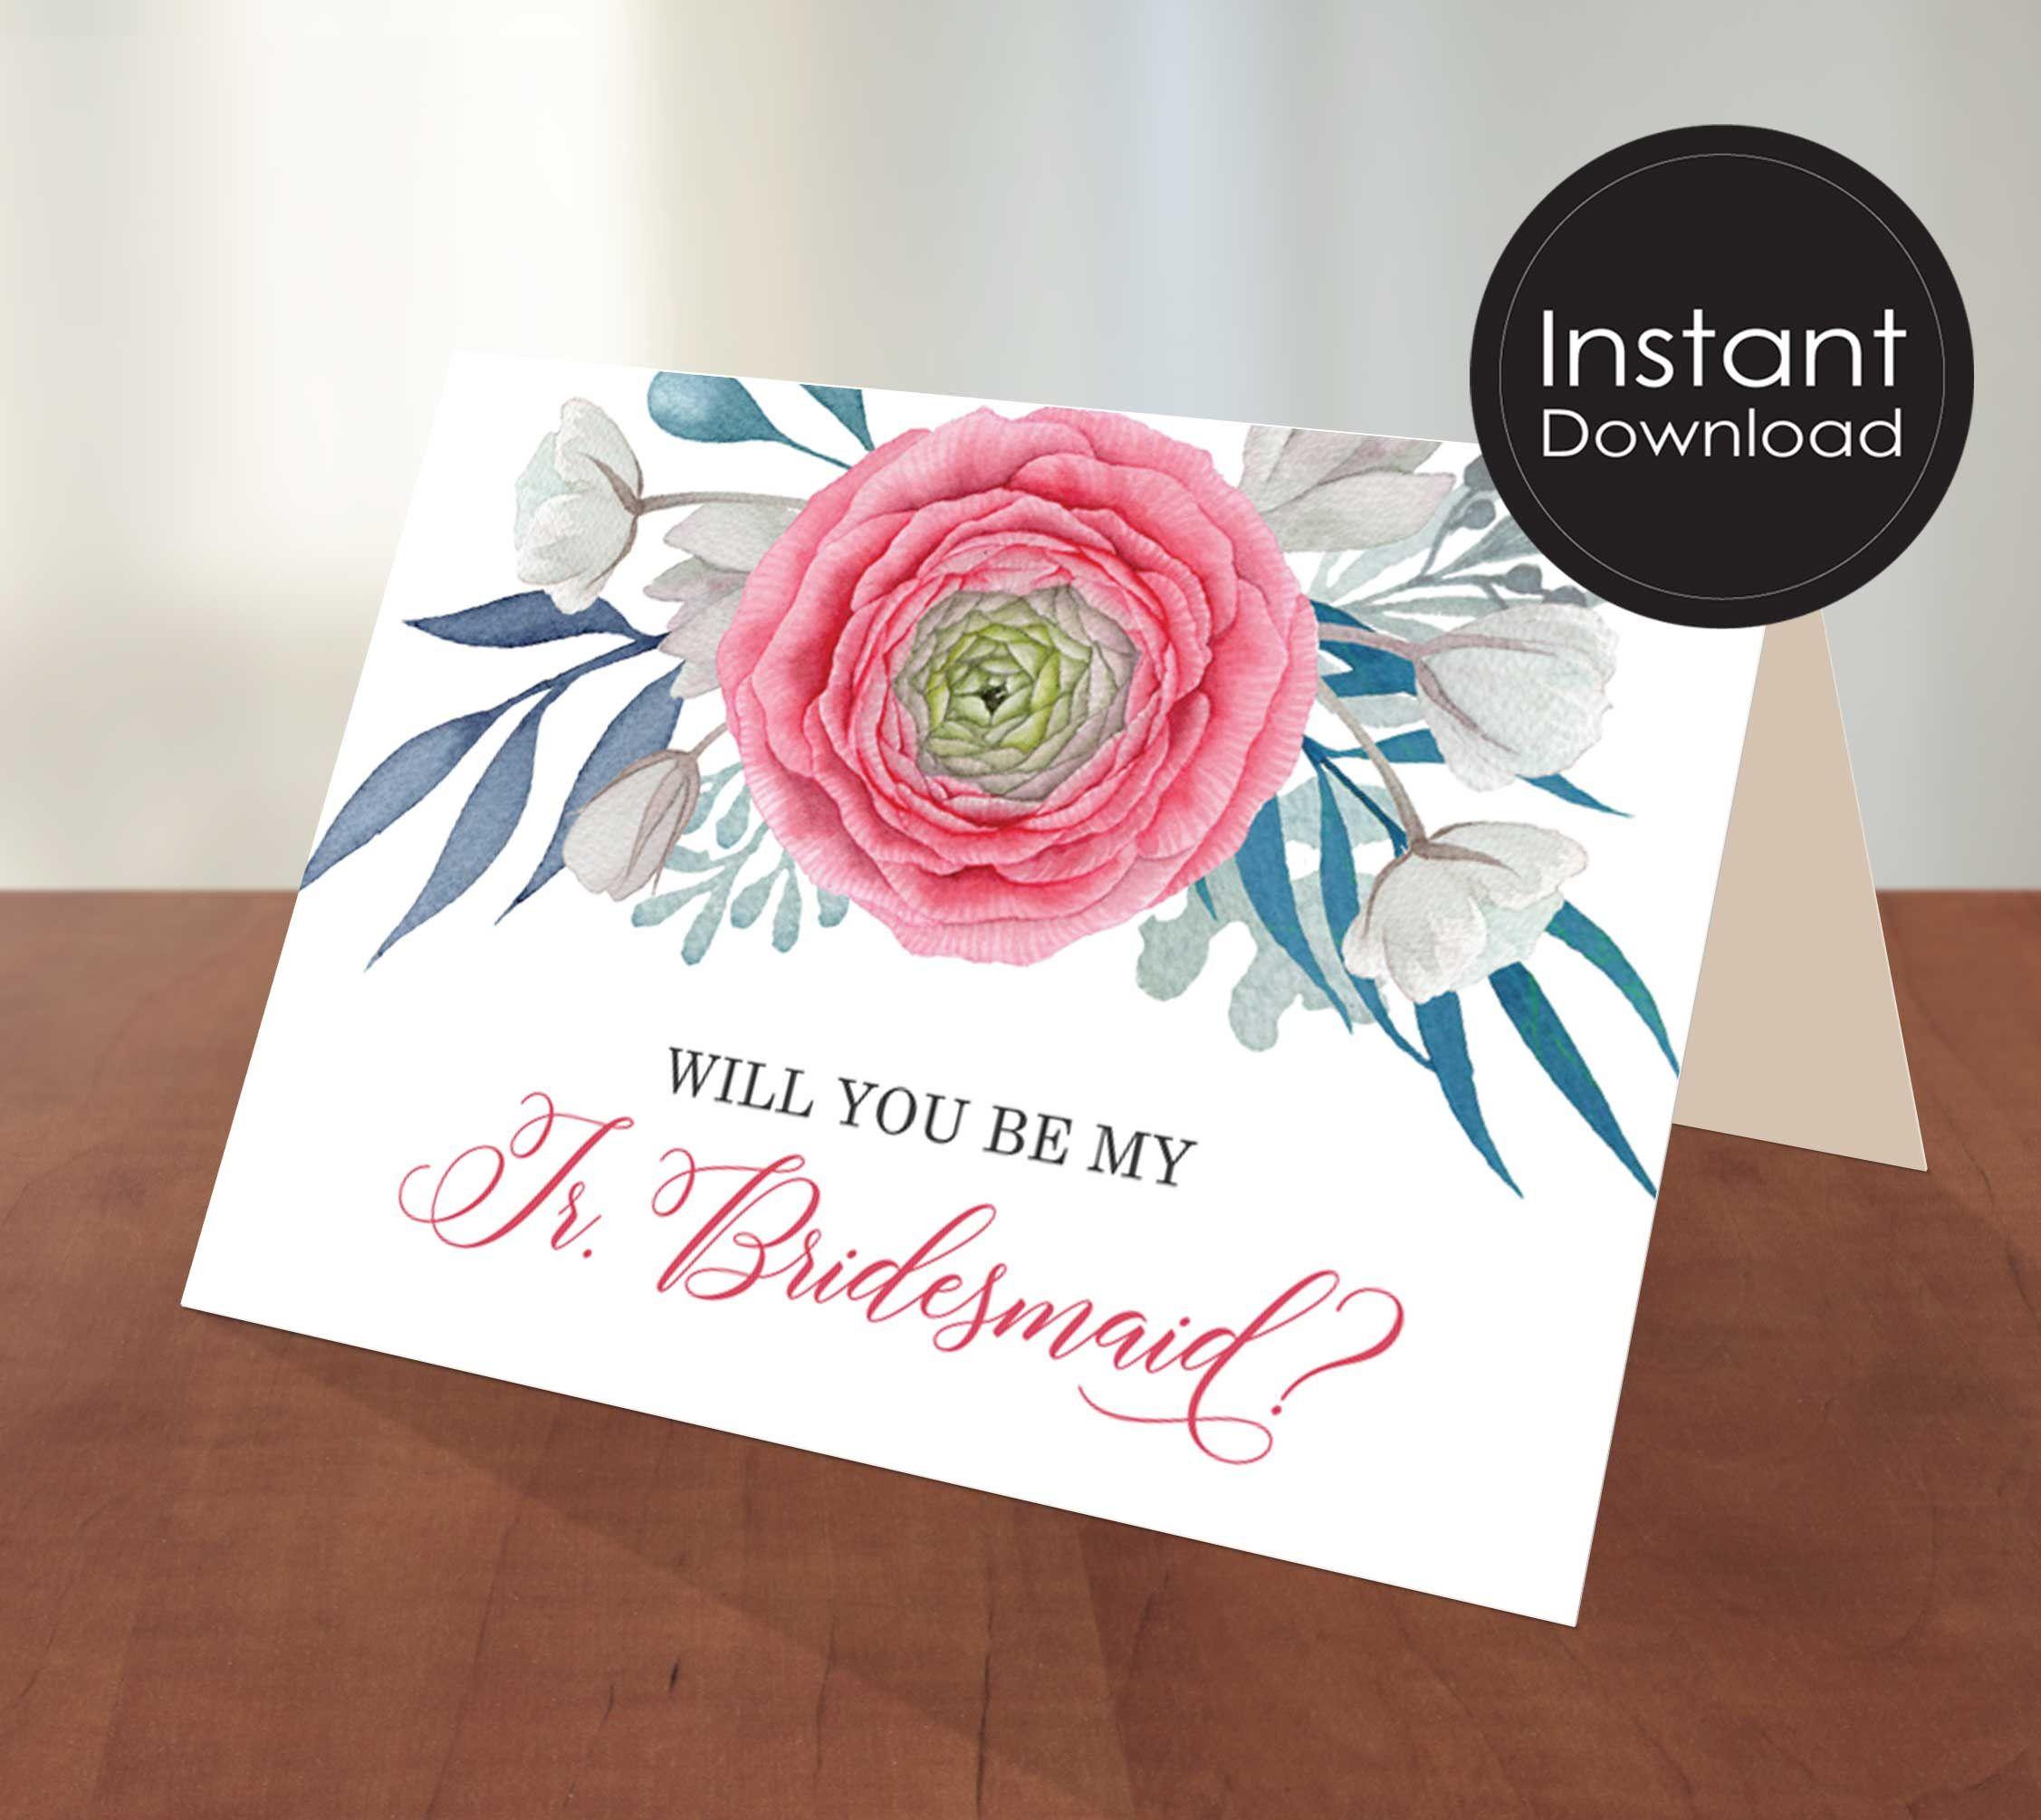 Junior bridesmaid proposal cardwill you be my junior